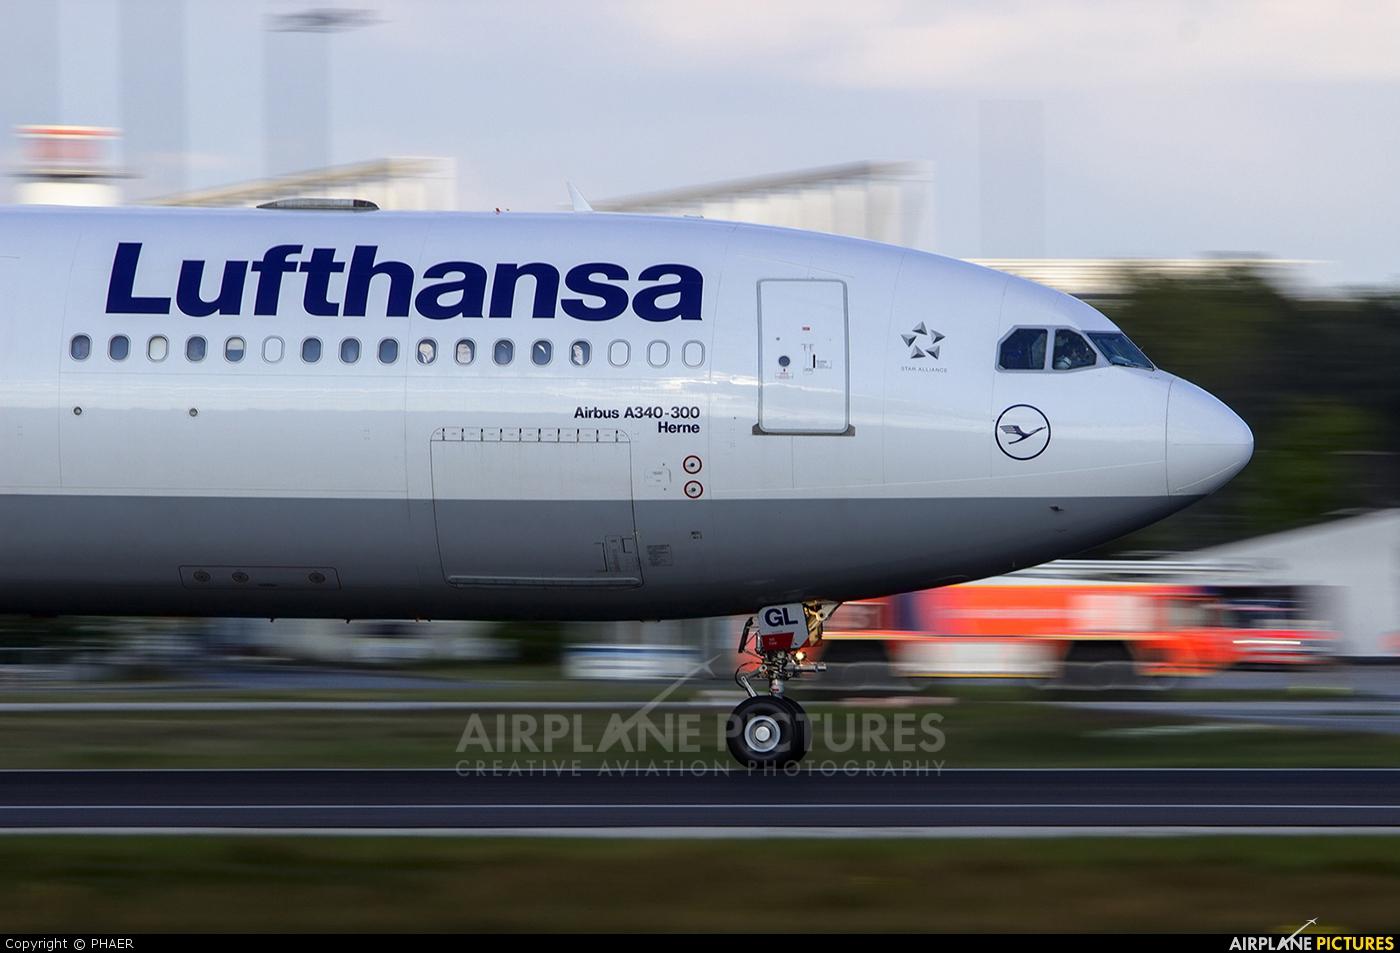 Lufthansa D-AIGL aircraft at Frankfurt